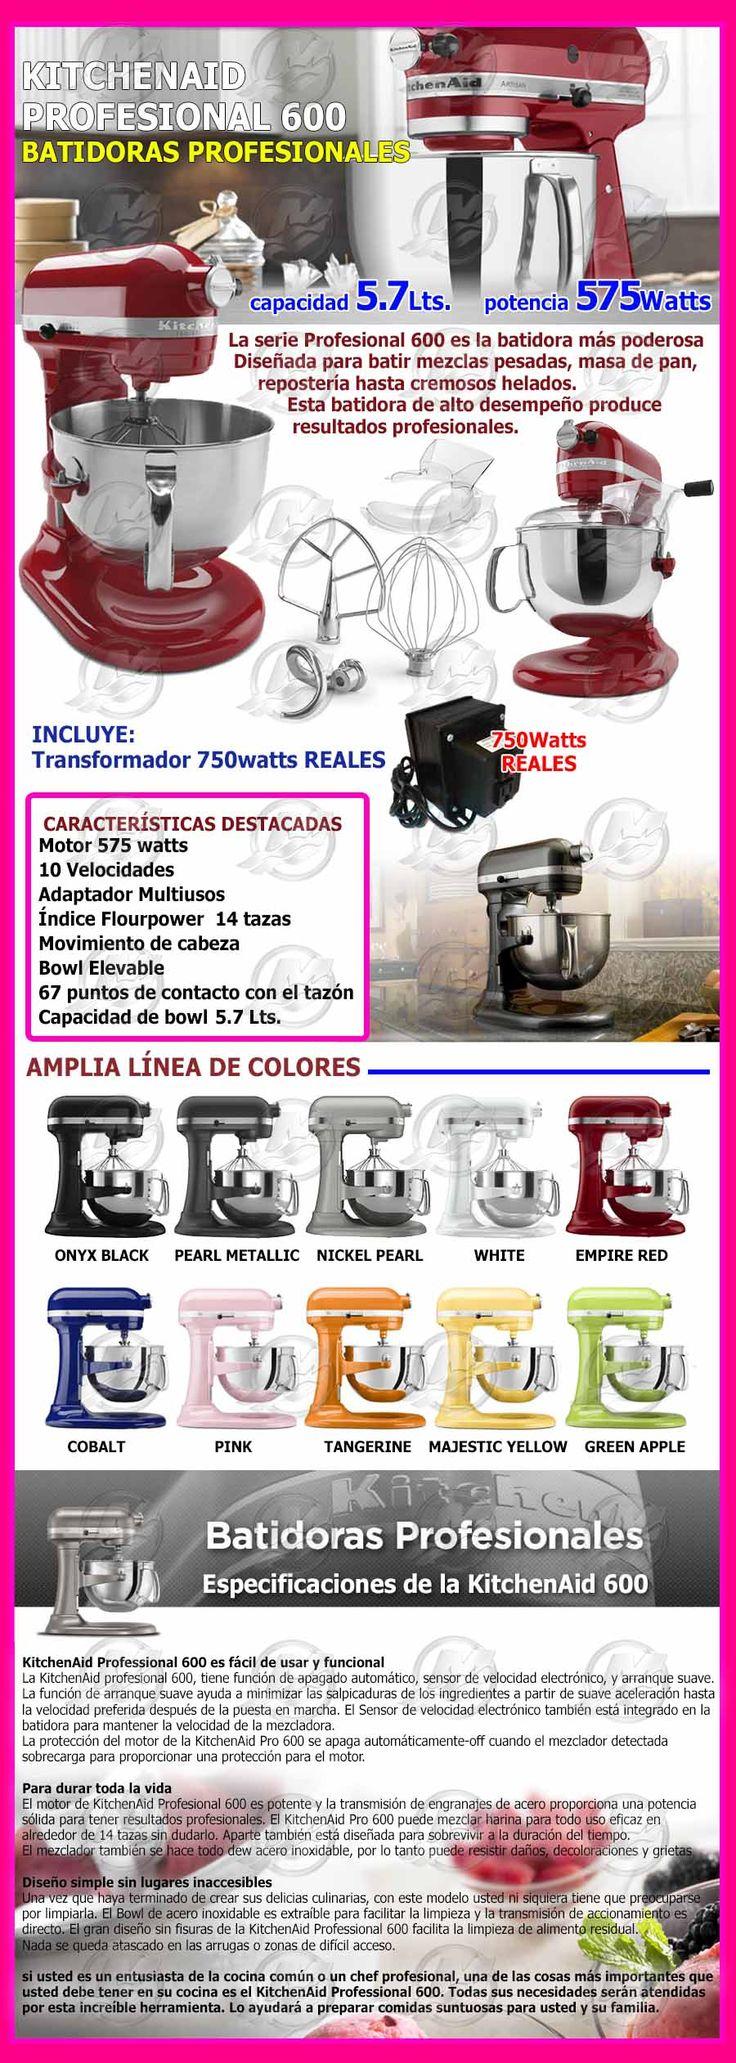 Kitchenaid Pro 610 kitchenaid pro 610 professional 620 bowllift on design decorating